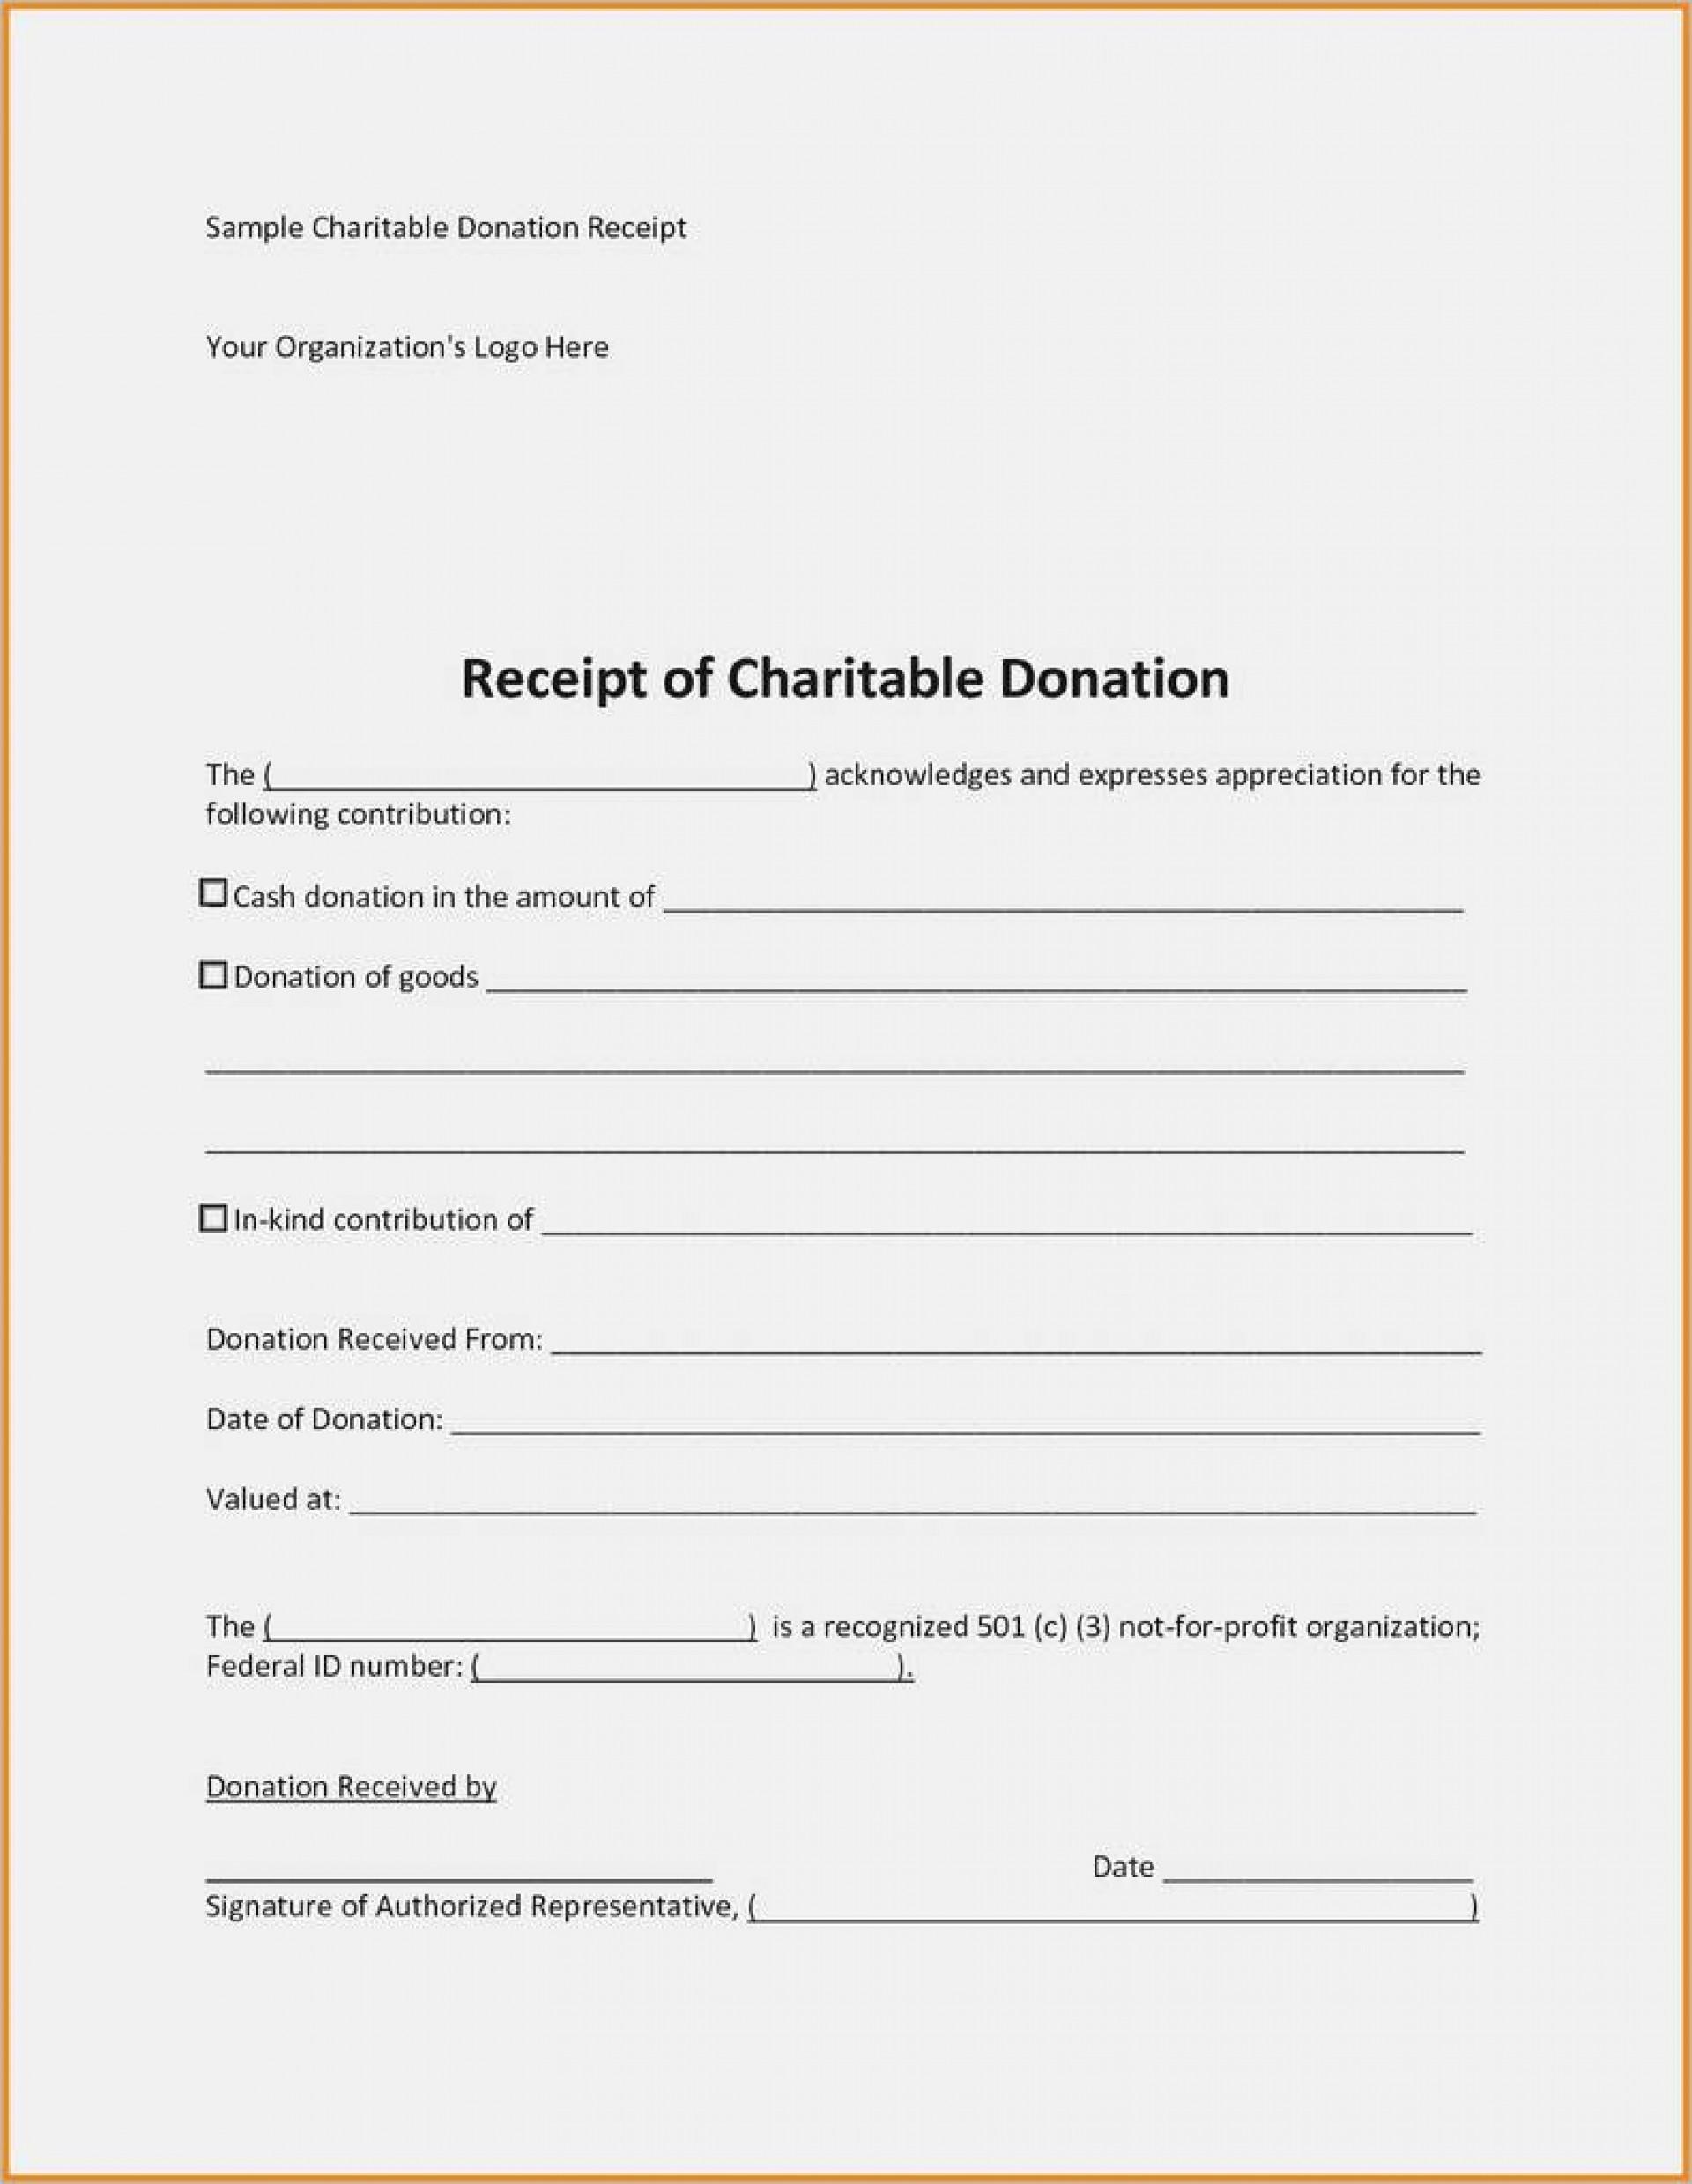 009 Formidable Tax Donation Receipt Template Design  Canadian Charitable Letter Church Deduction1920